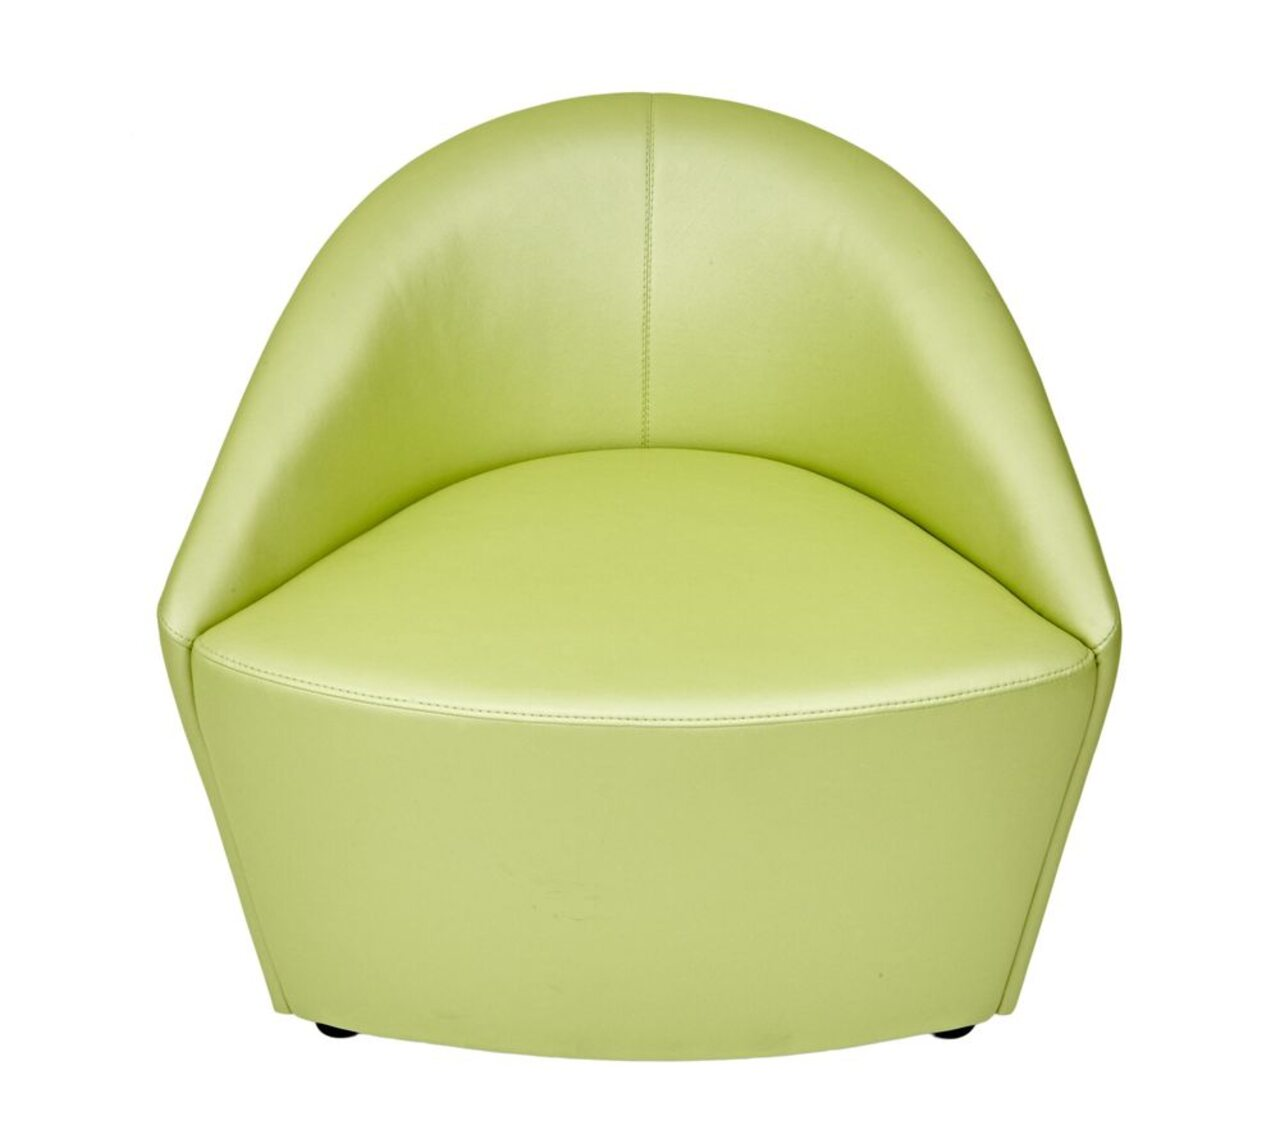 Кресло стационарное  3D 79x65x71 - фото 8